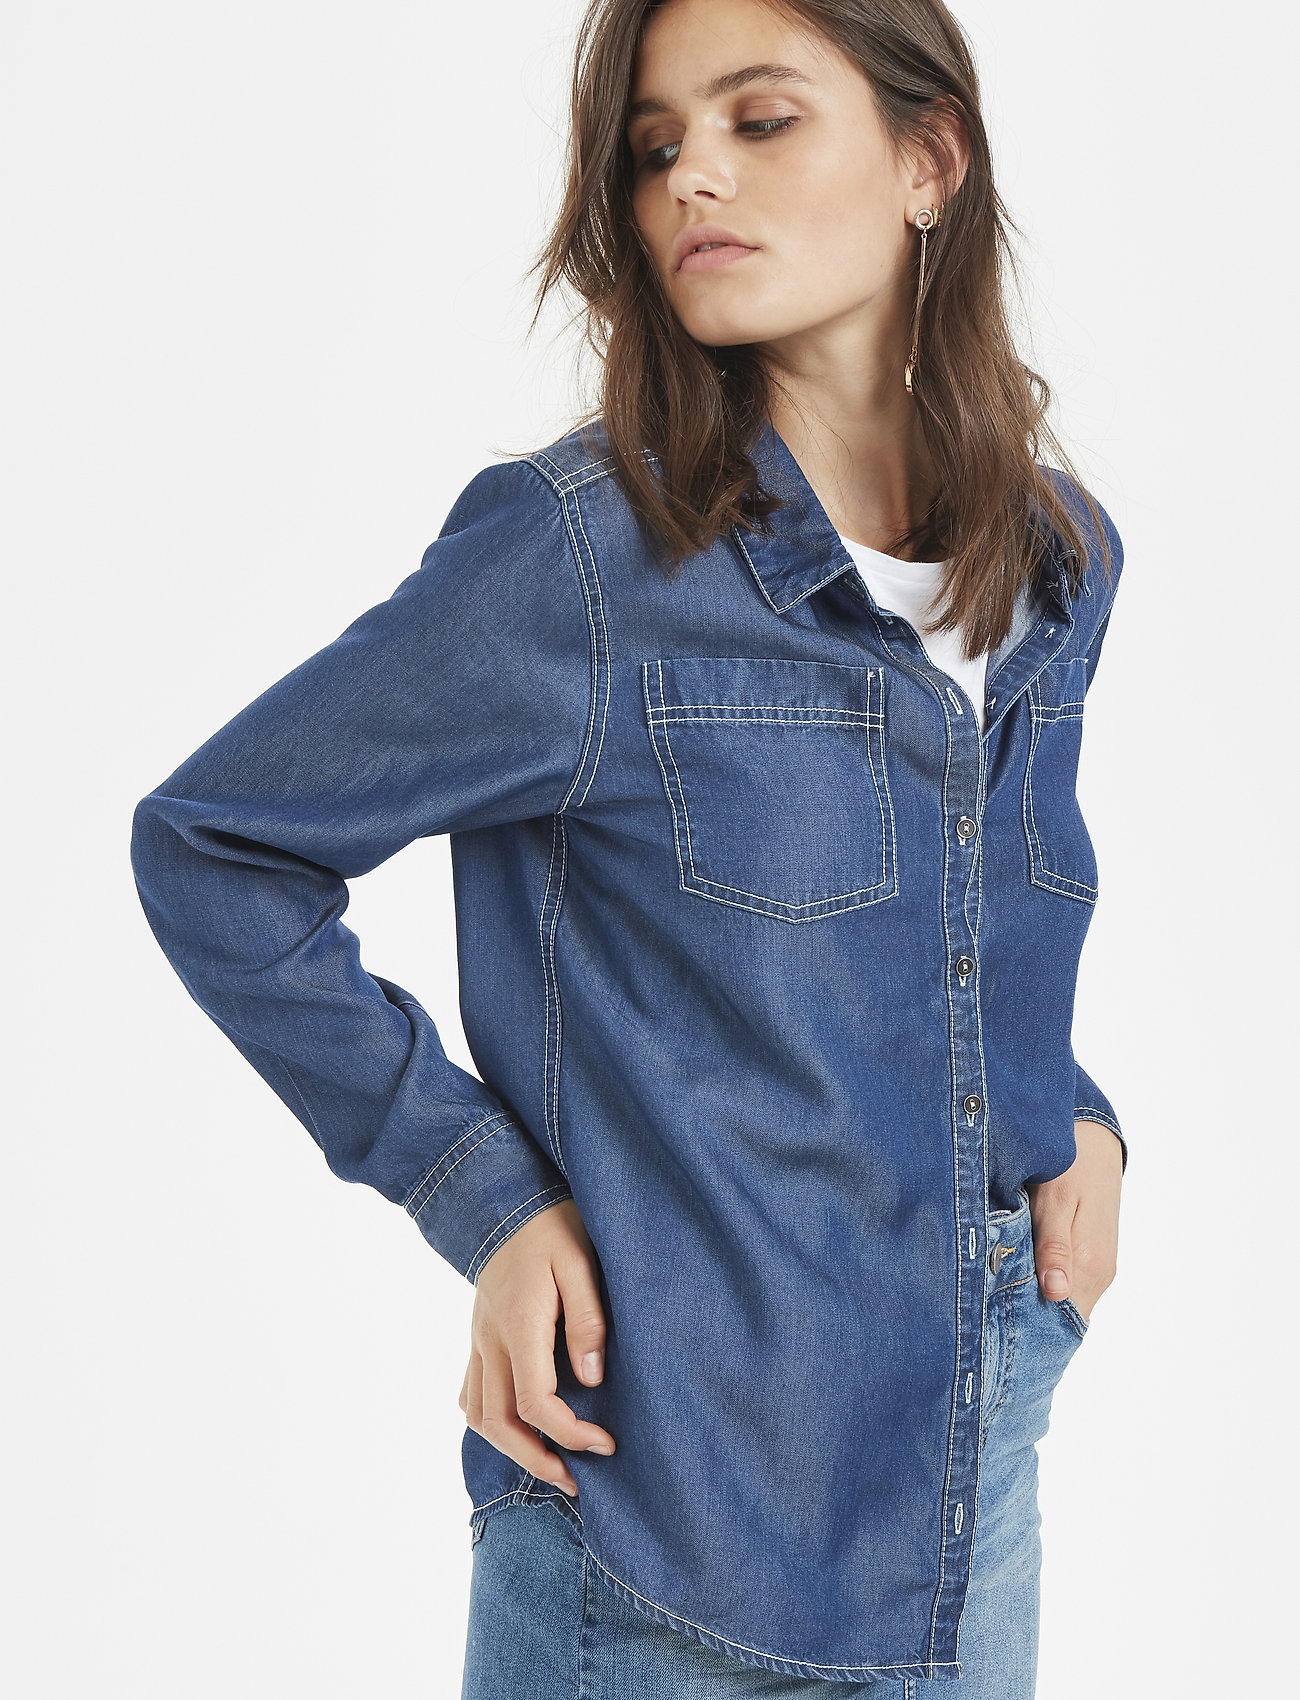 Denim Hunter - 15 THE DENIM SHIRT - jeansskjortor - denim blue - 0